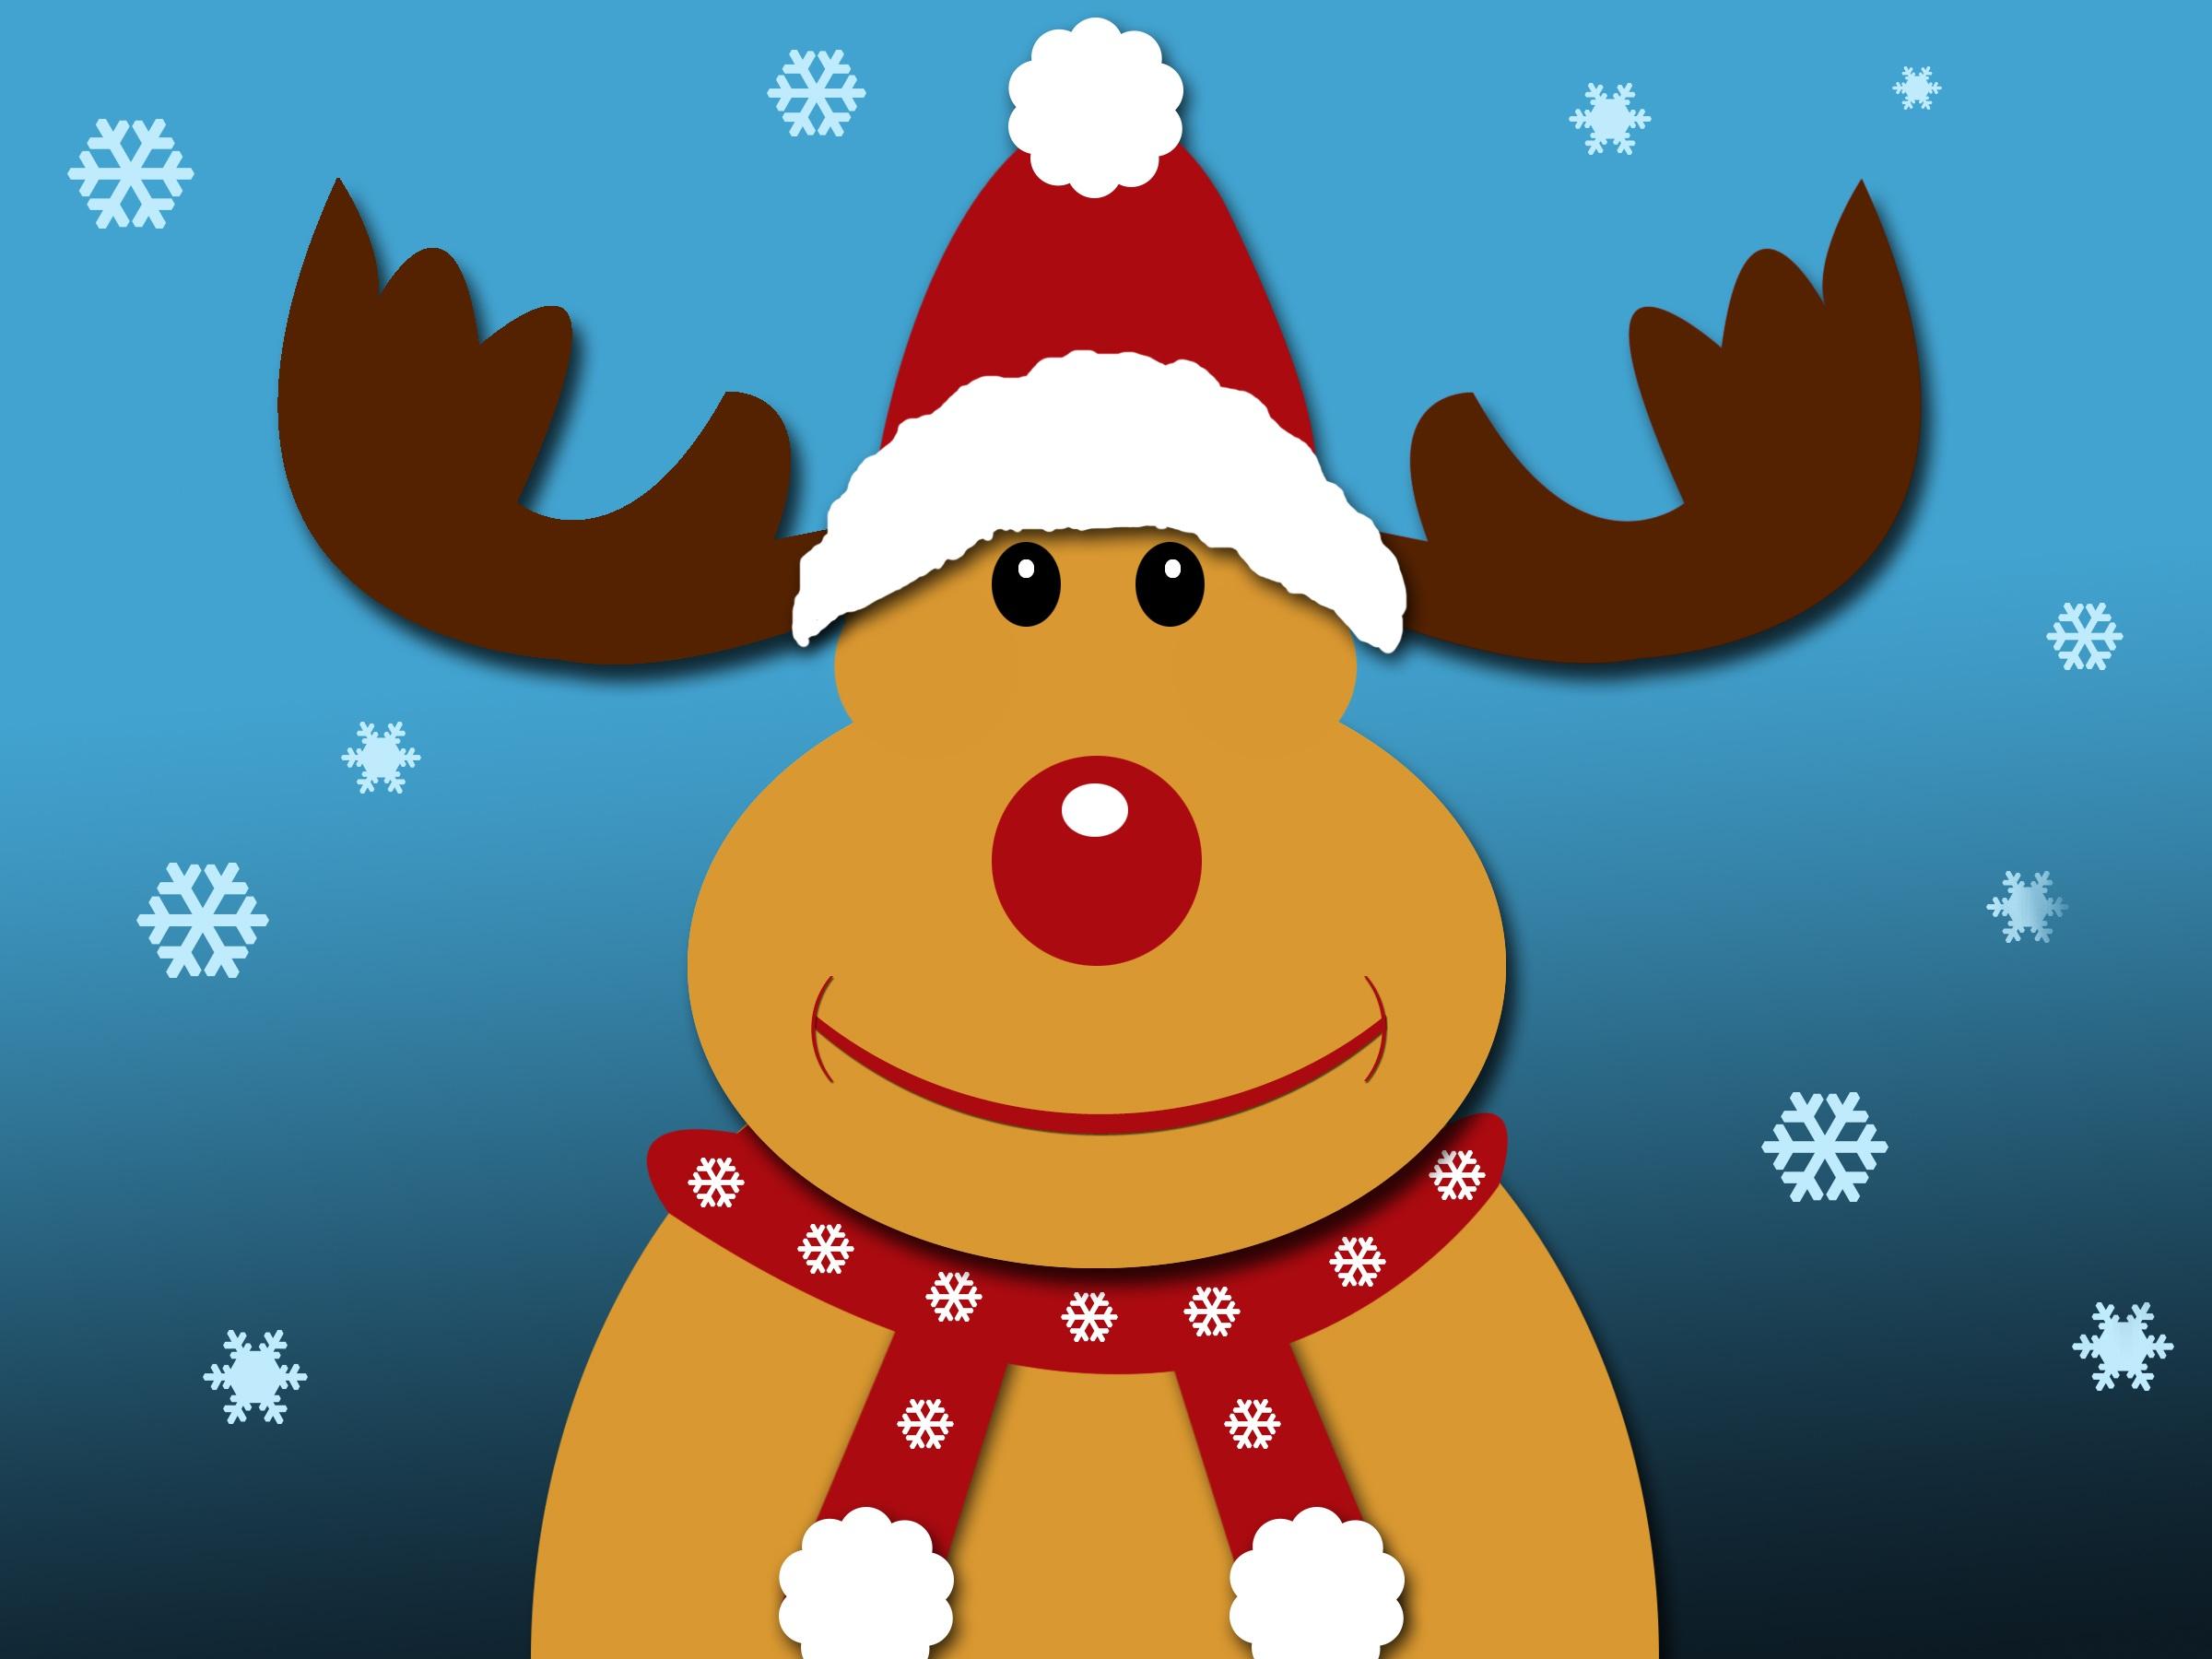 Sfondi Natalizi Renne.Sfondi Rudolph Renna Natale Nuovo Anno 2400x1800 4kwallpaper 995047 Sfondi Gratis Wallhere